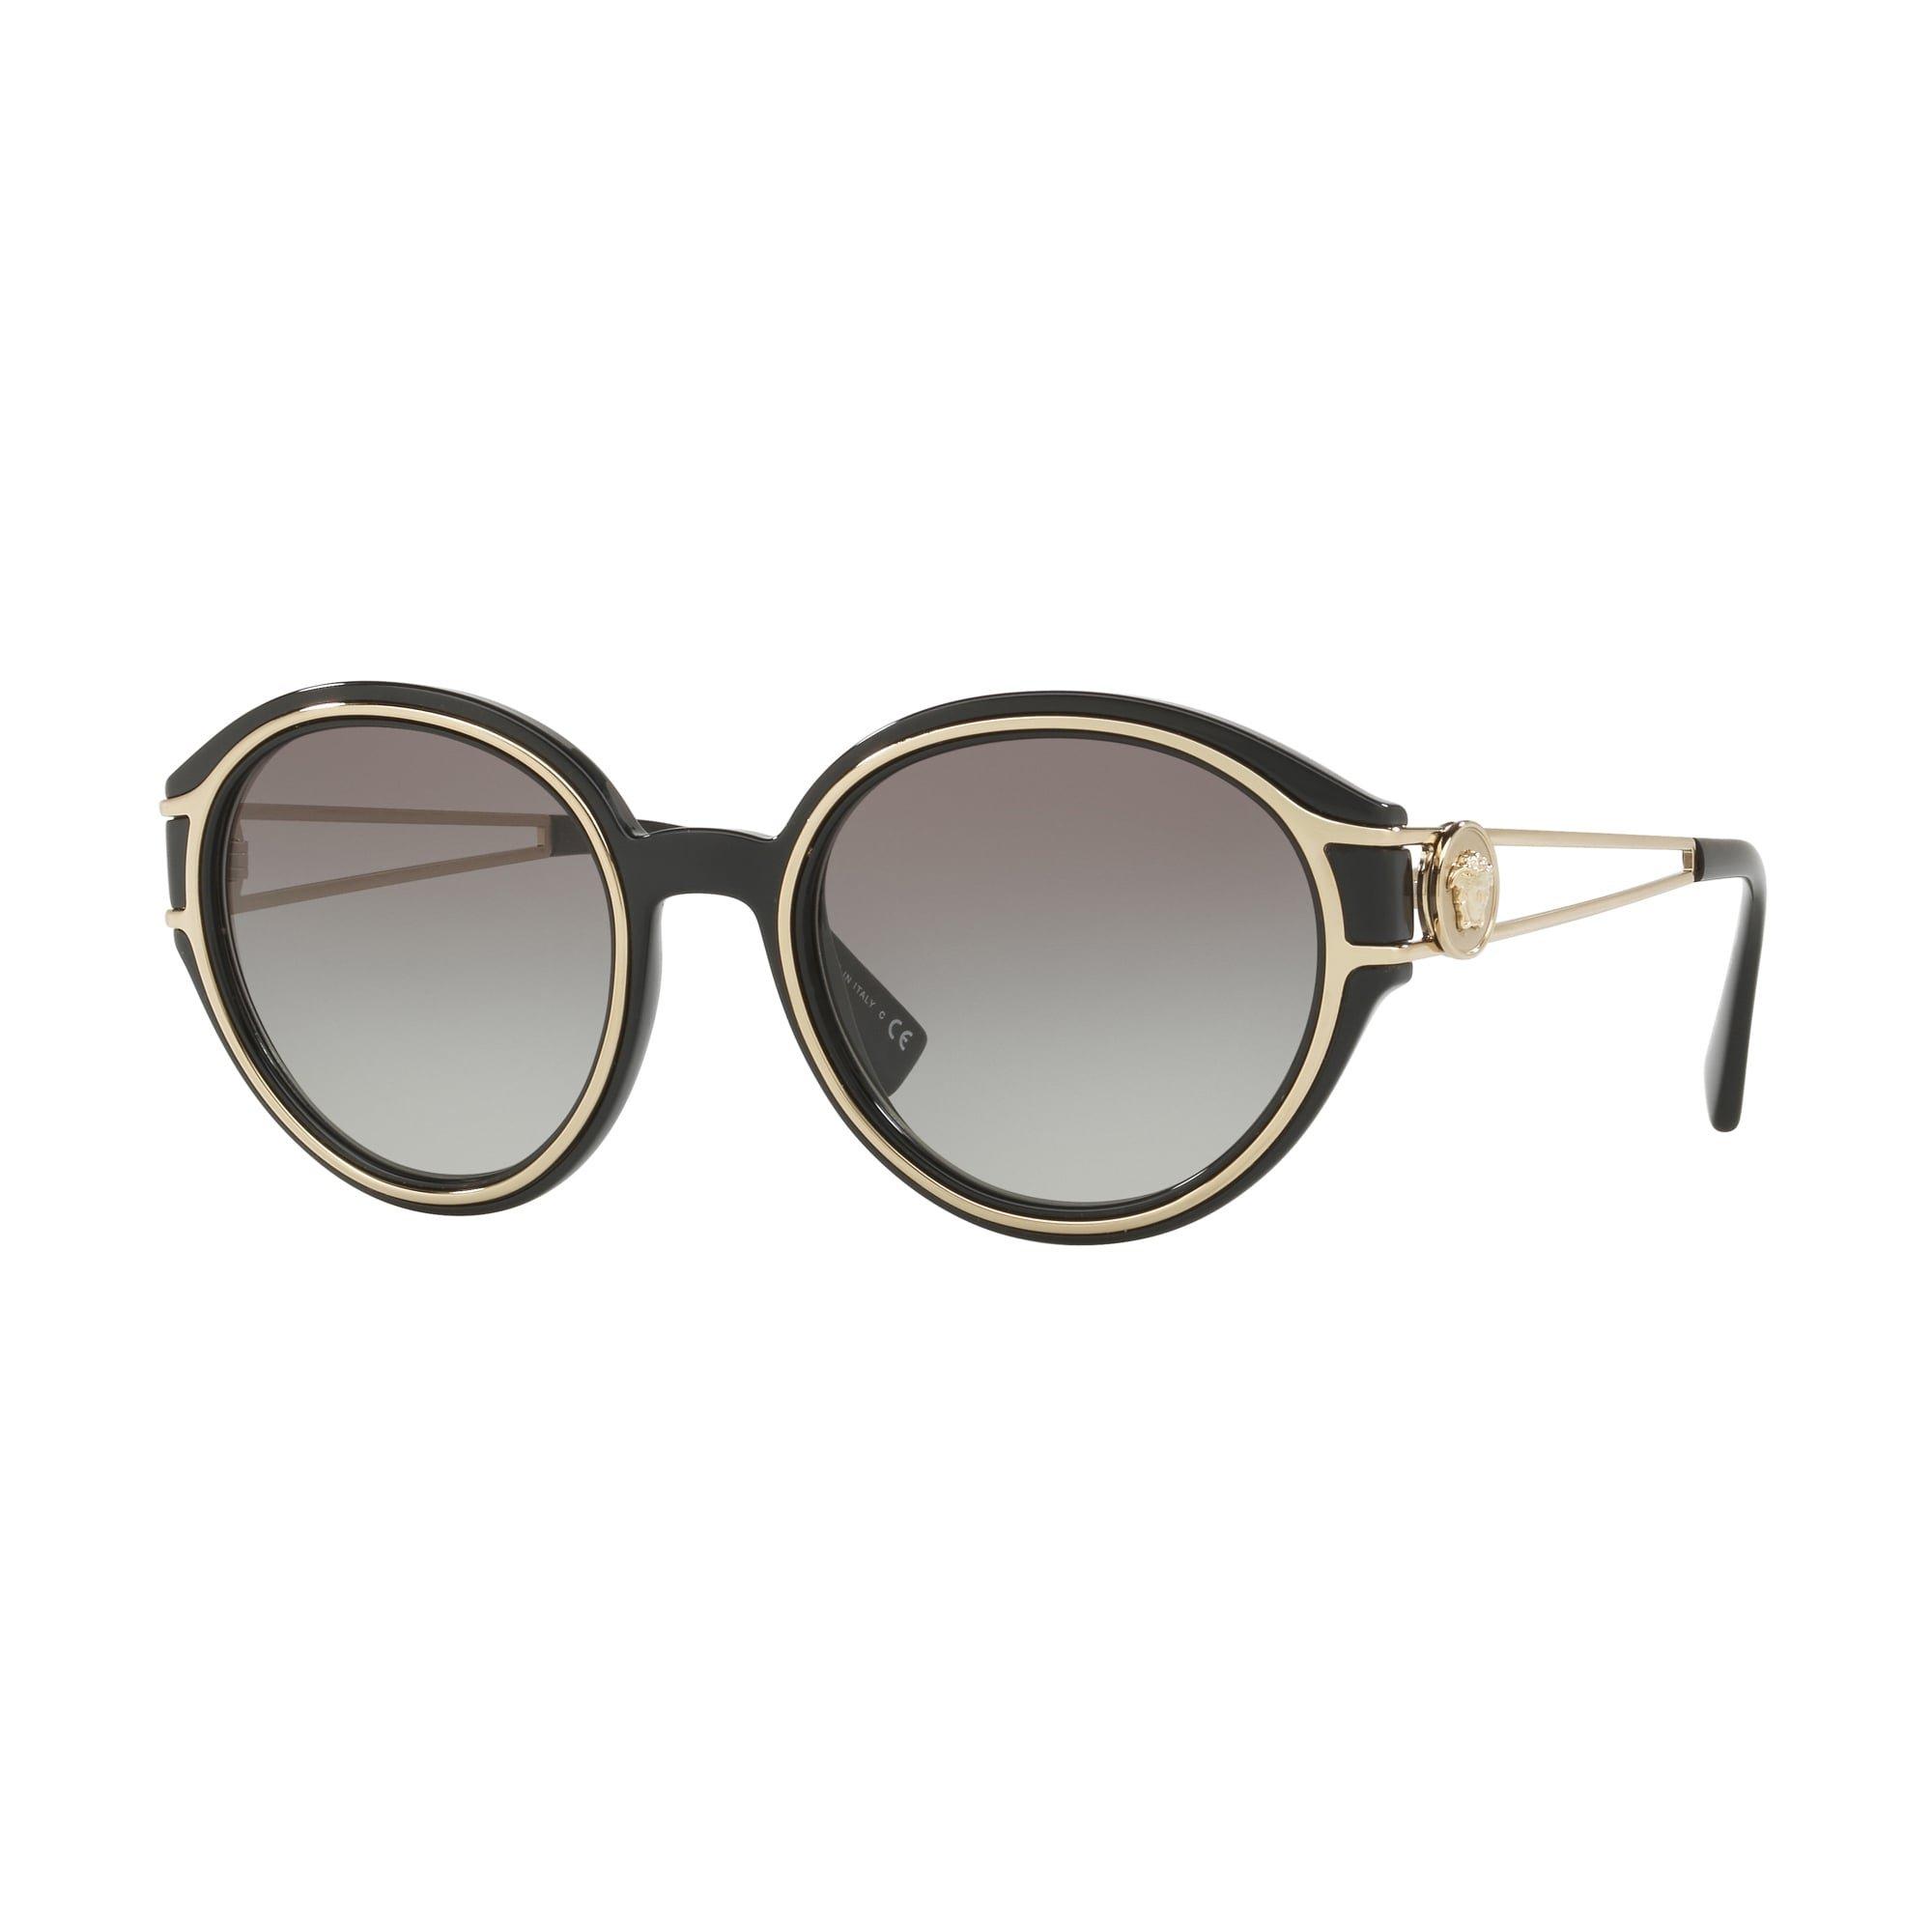 Versace Women's VE4342 Black/Pale Gold/Grey One Size